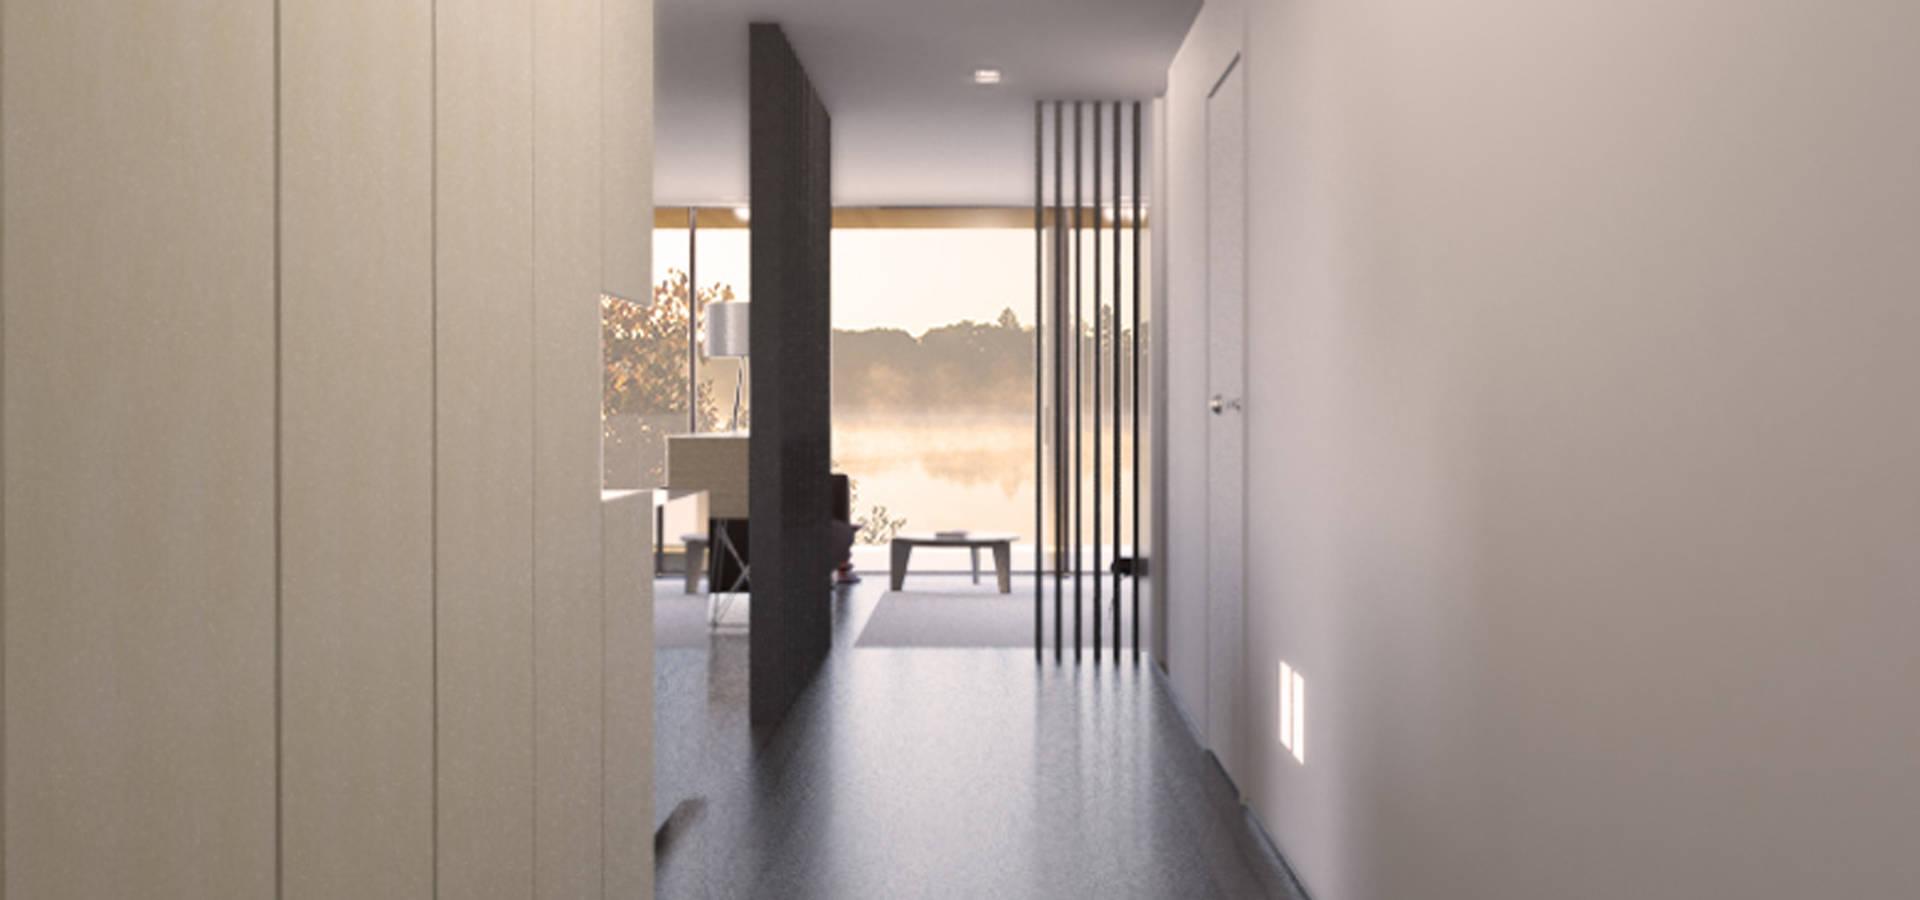 ZDA Zanetti Design Architettura